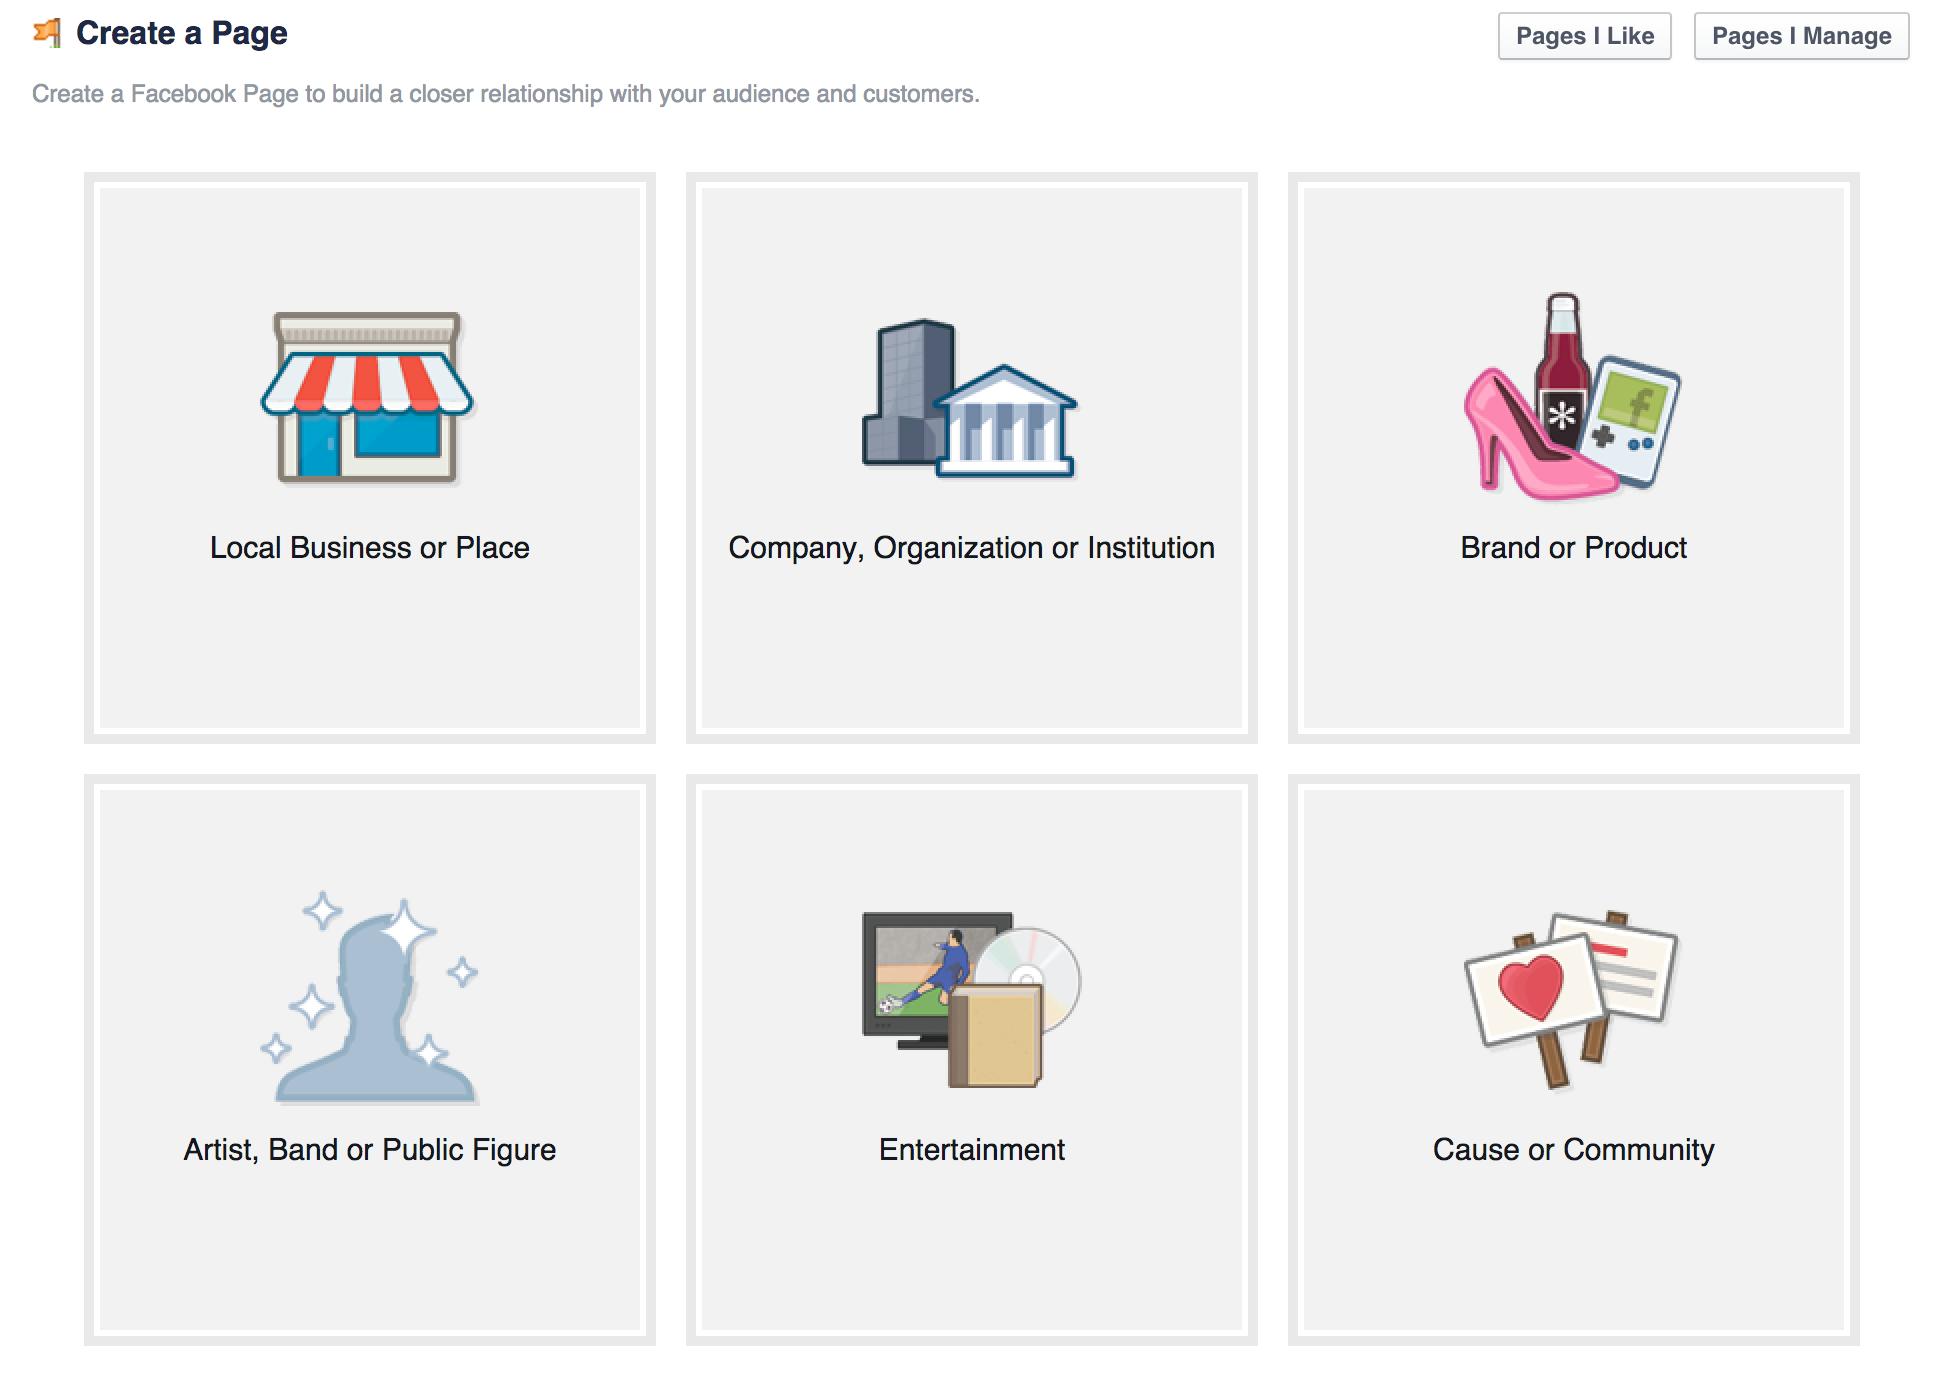 facebook-create-page